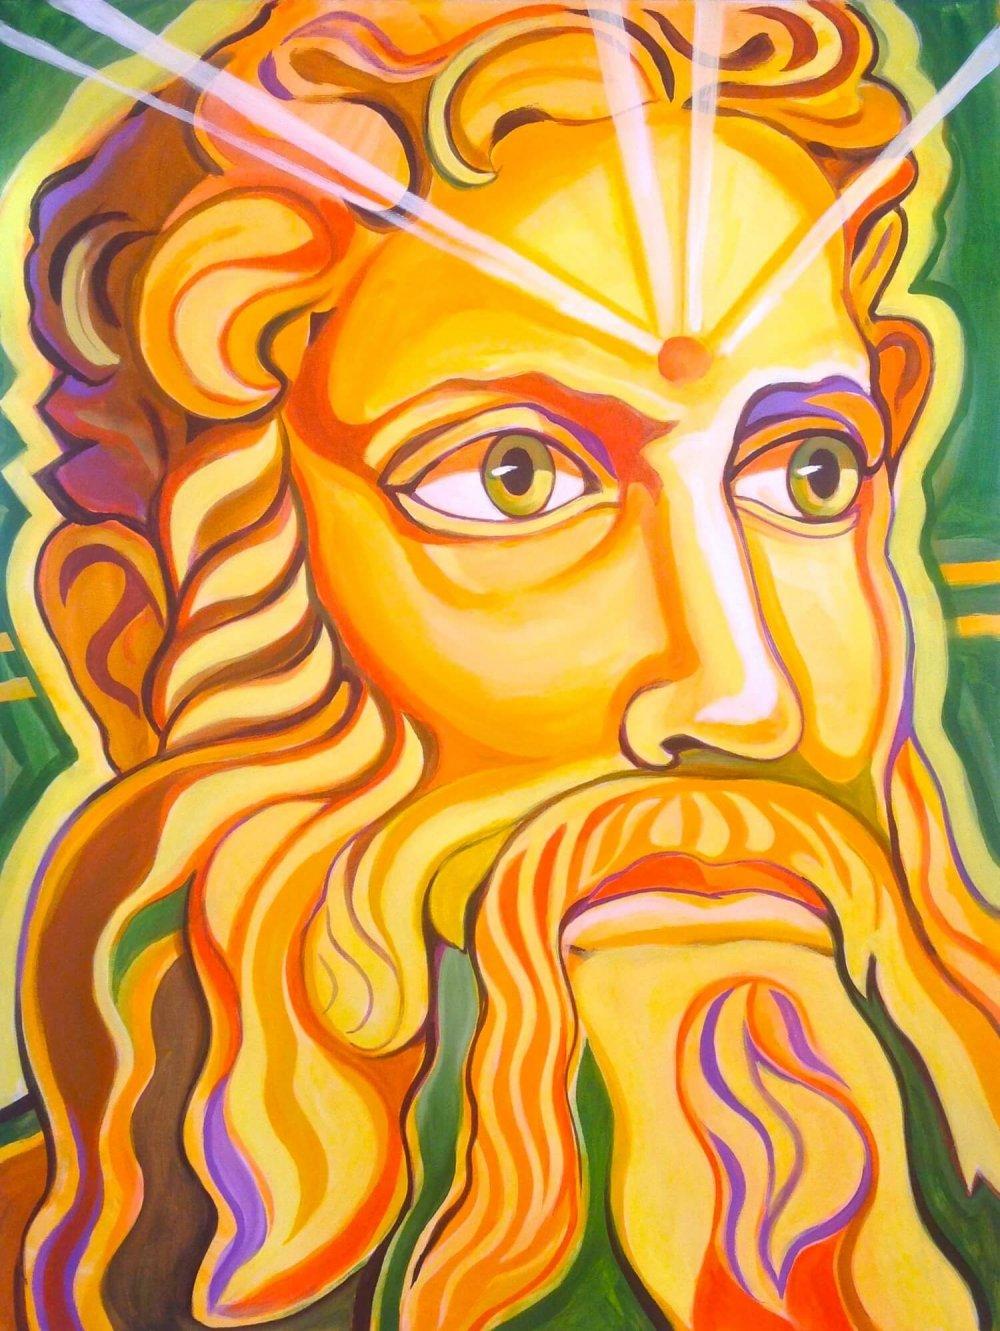 Moses of Israel - Paintings - Markus Ray's Art